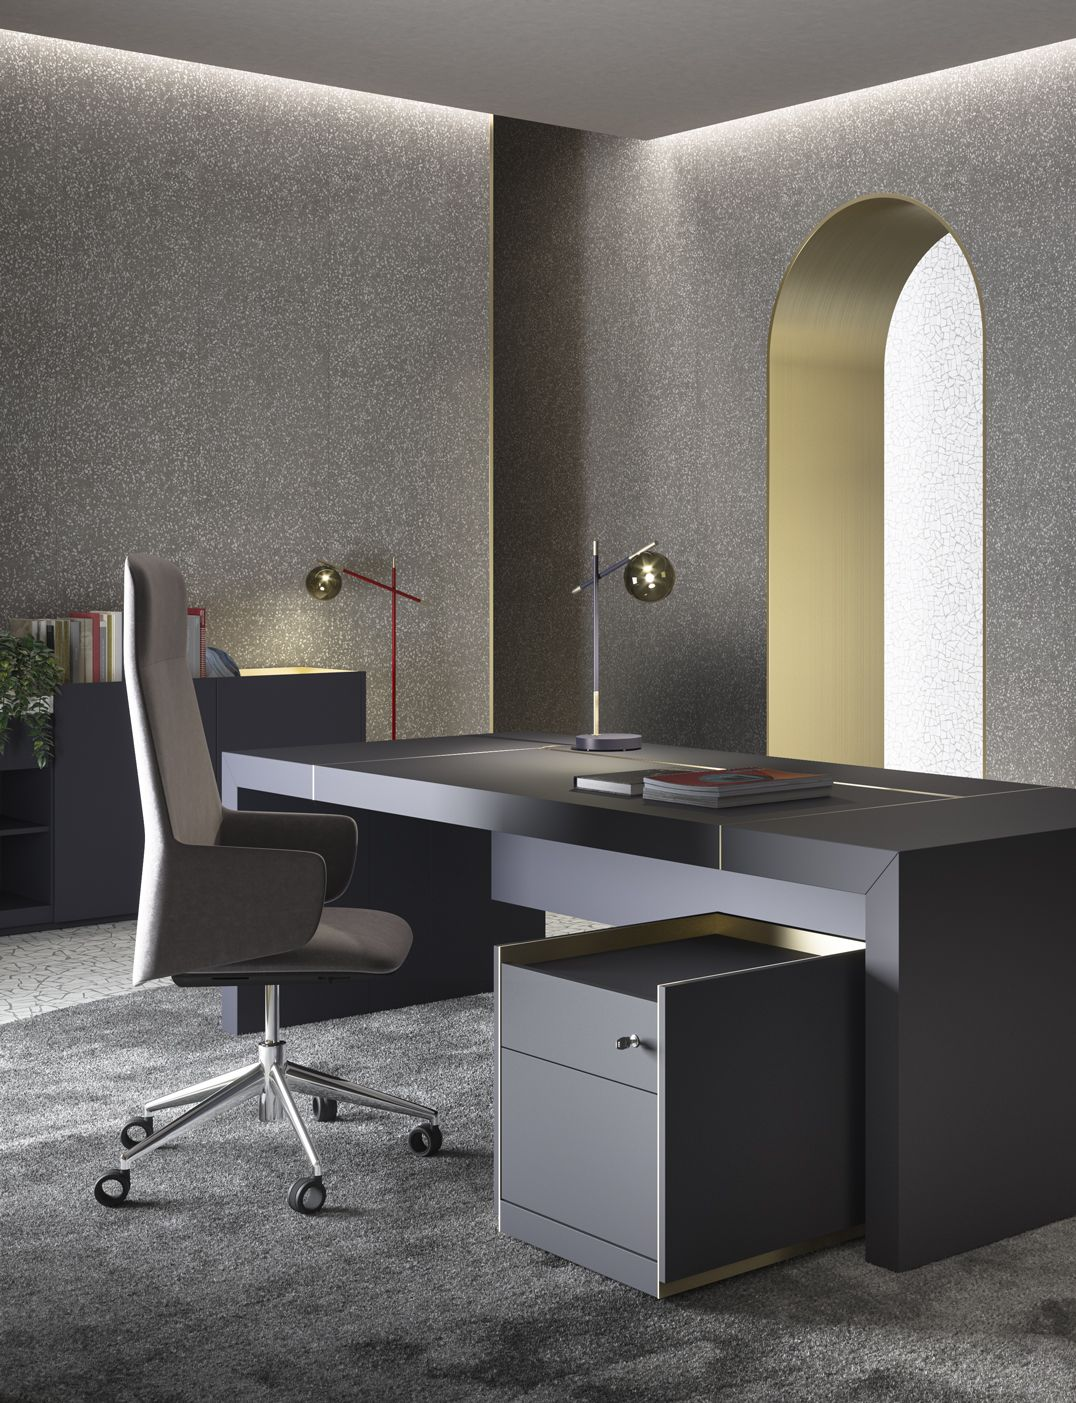 Block 2 0 Executive Office Desk By Prof Office Ad Rmdesignstudio Office Table Design Modern Office Space Design Home Office Design